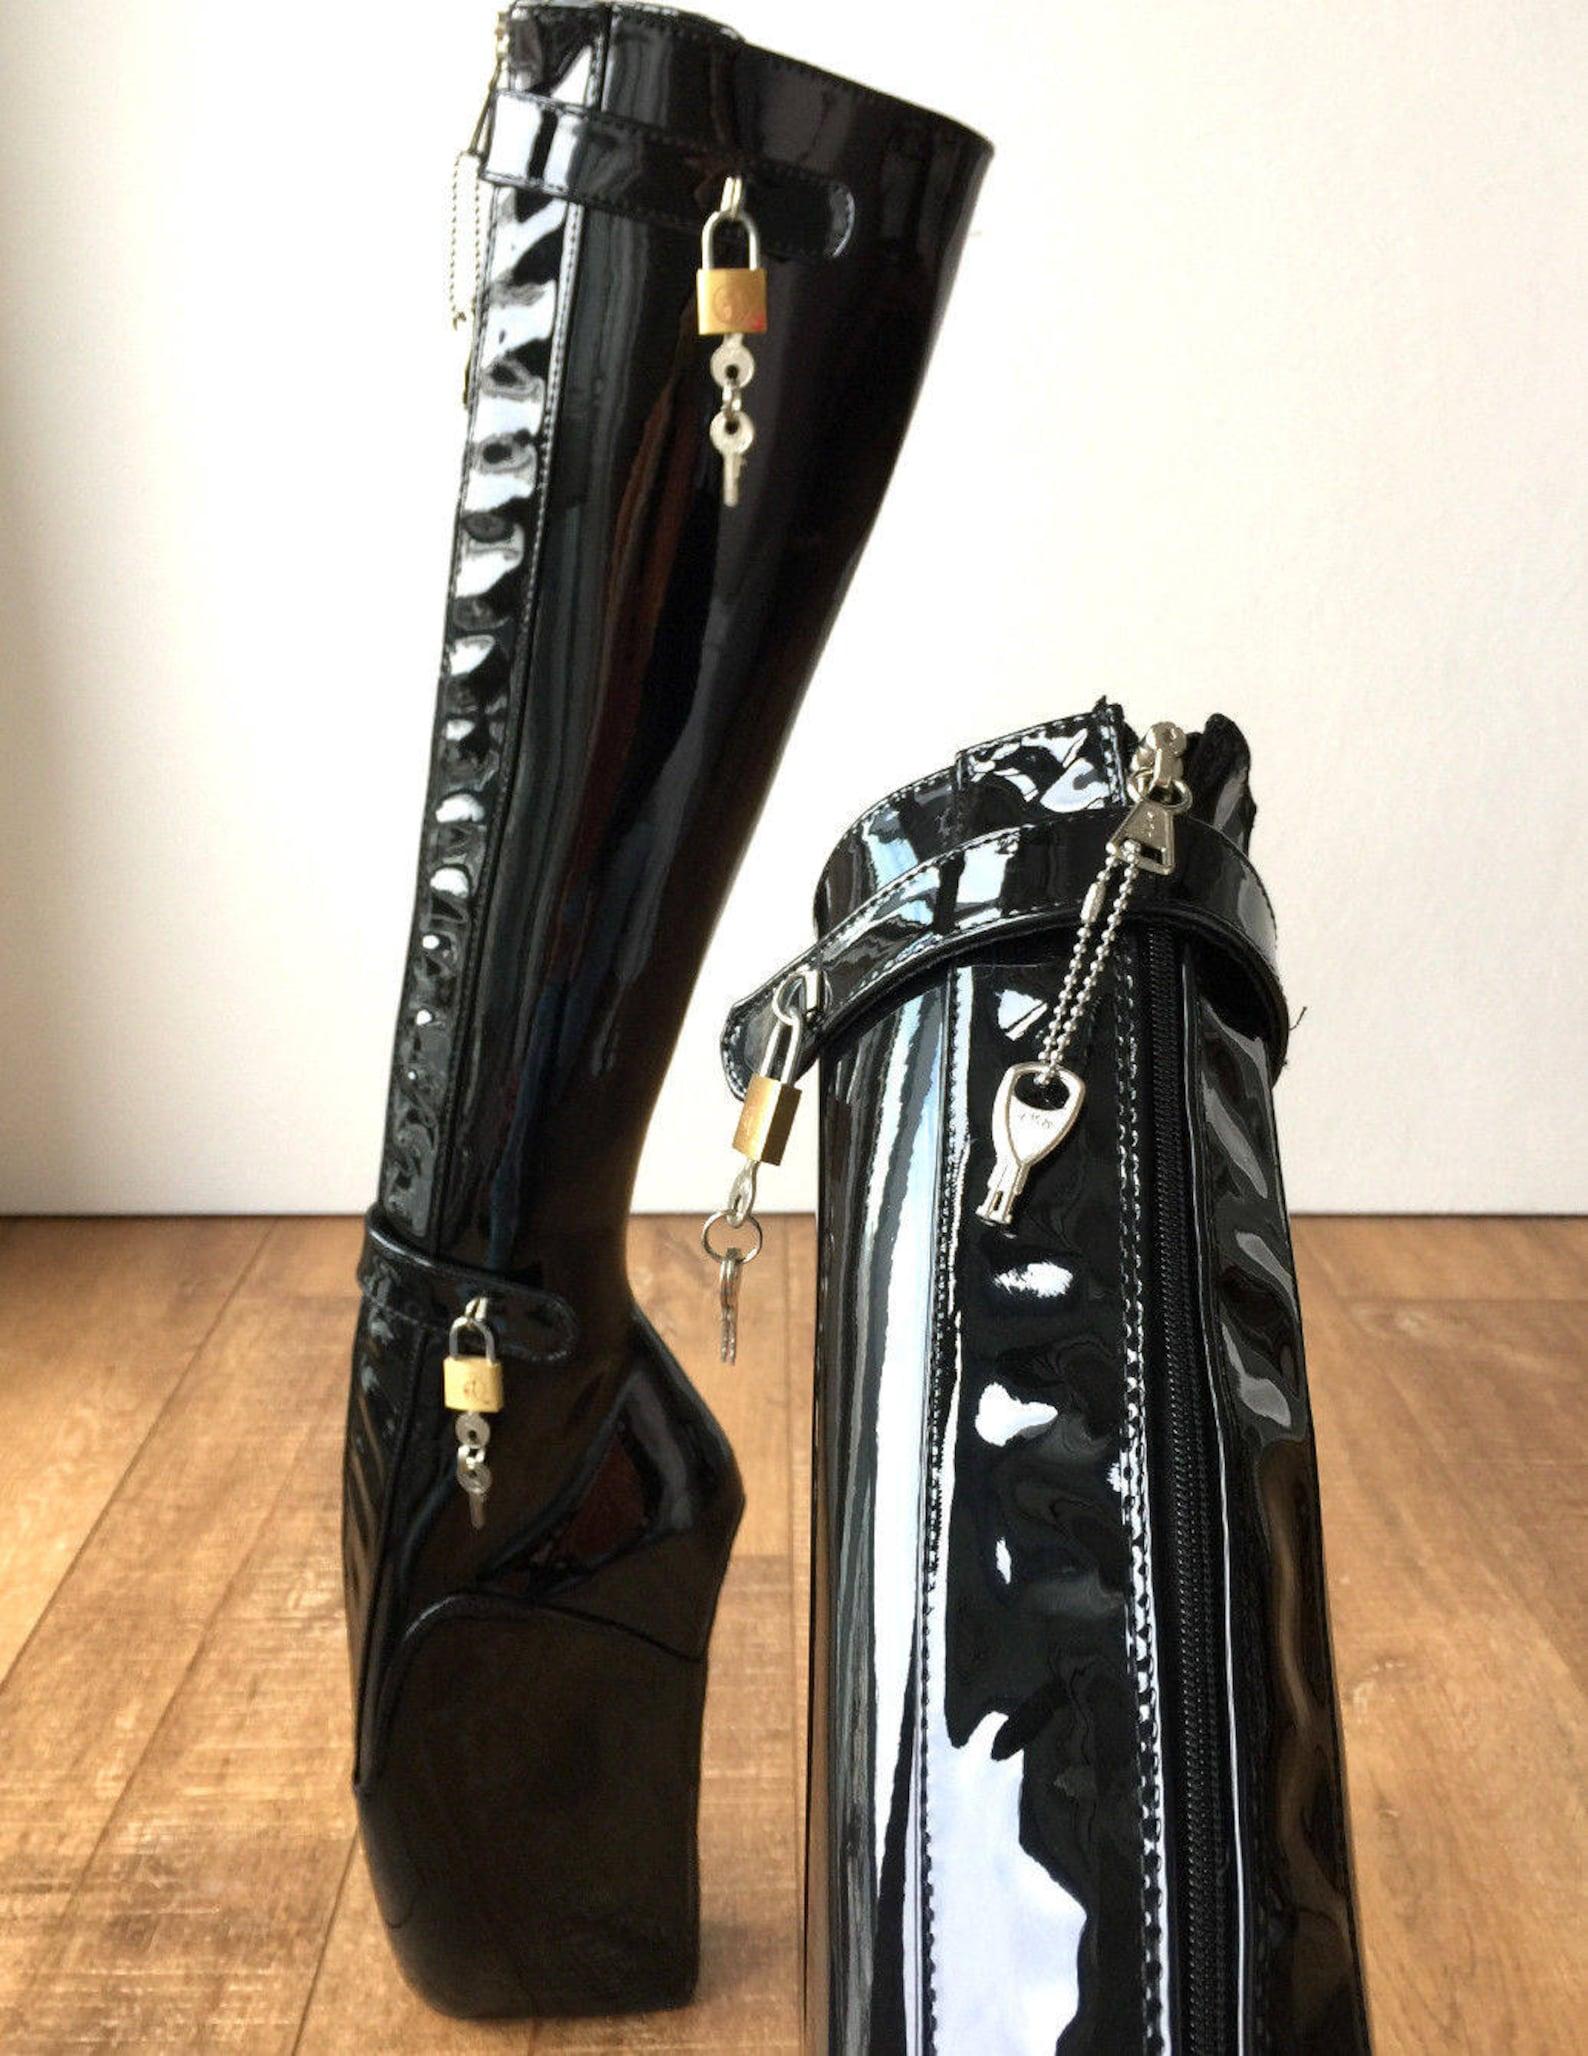 rtbu 6 keys locking zip beginner ballet wedge boot fetish dominatrix black